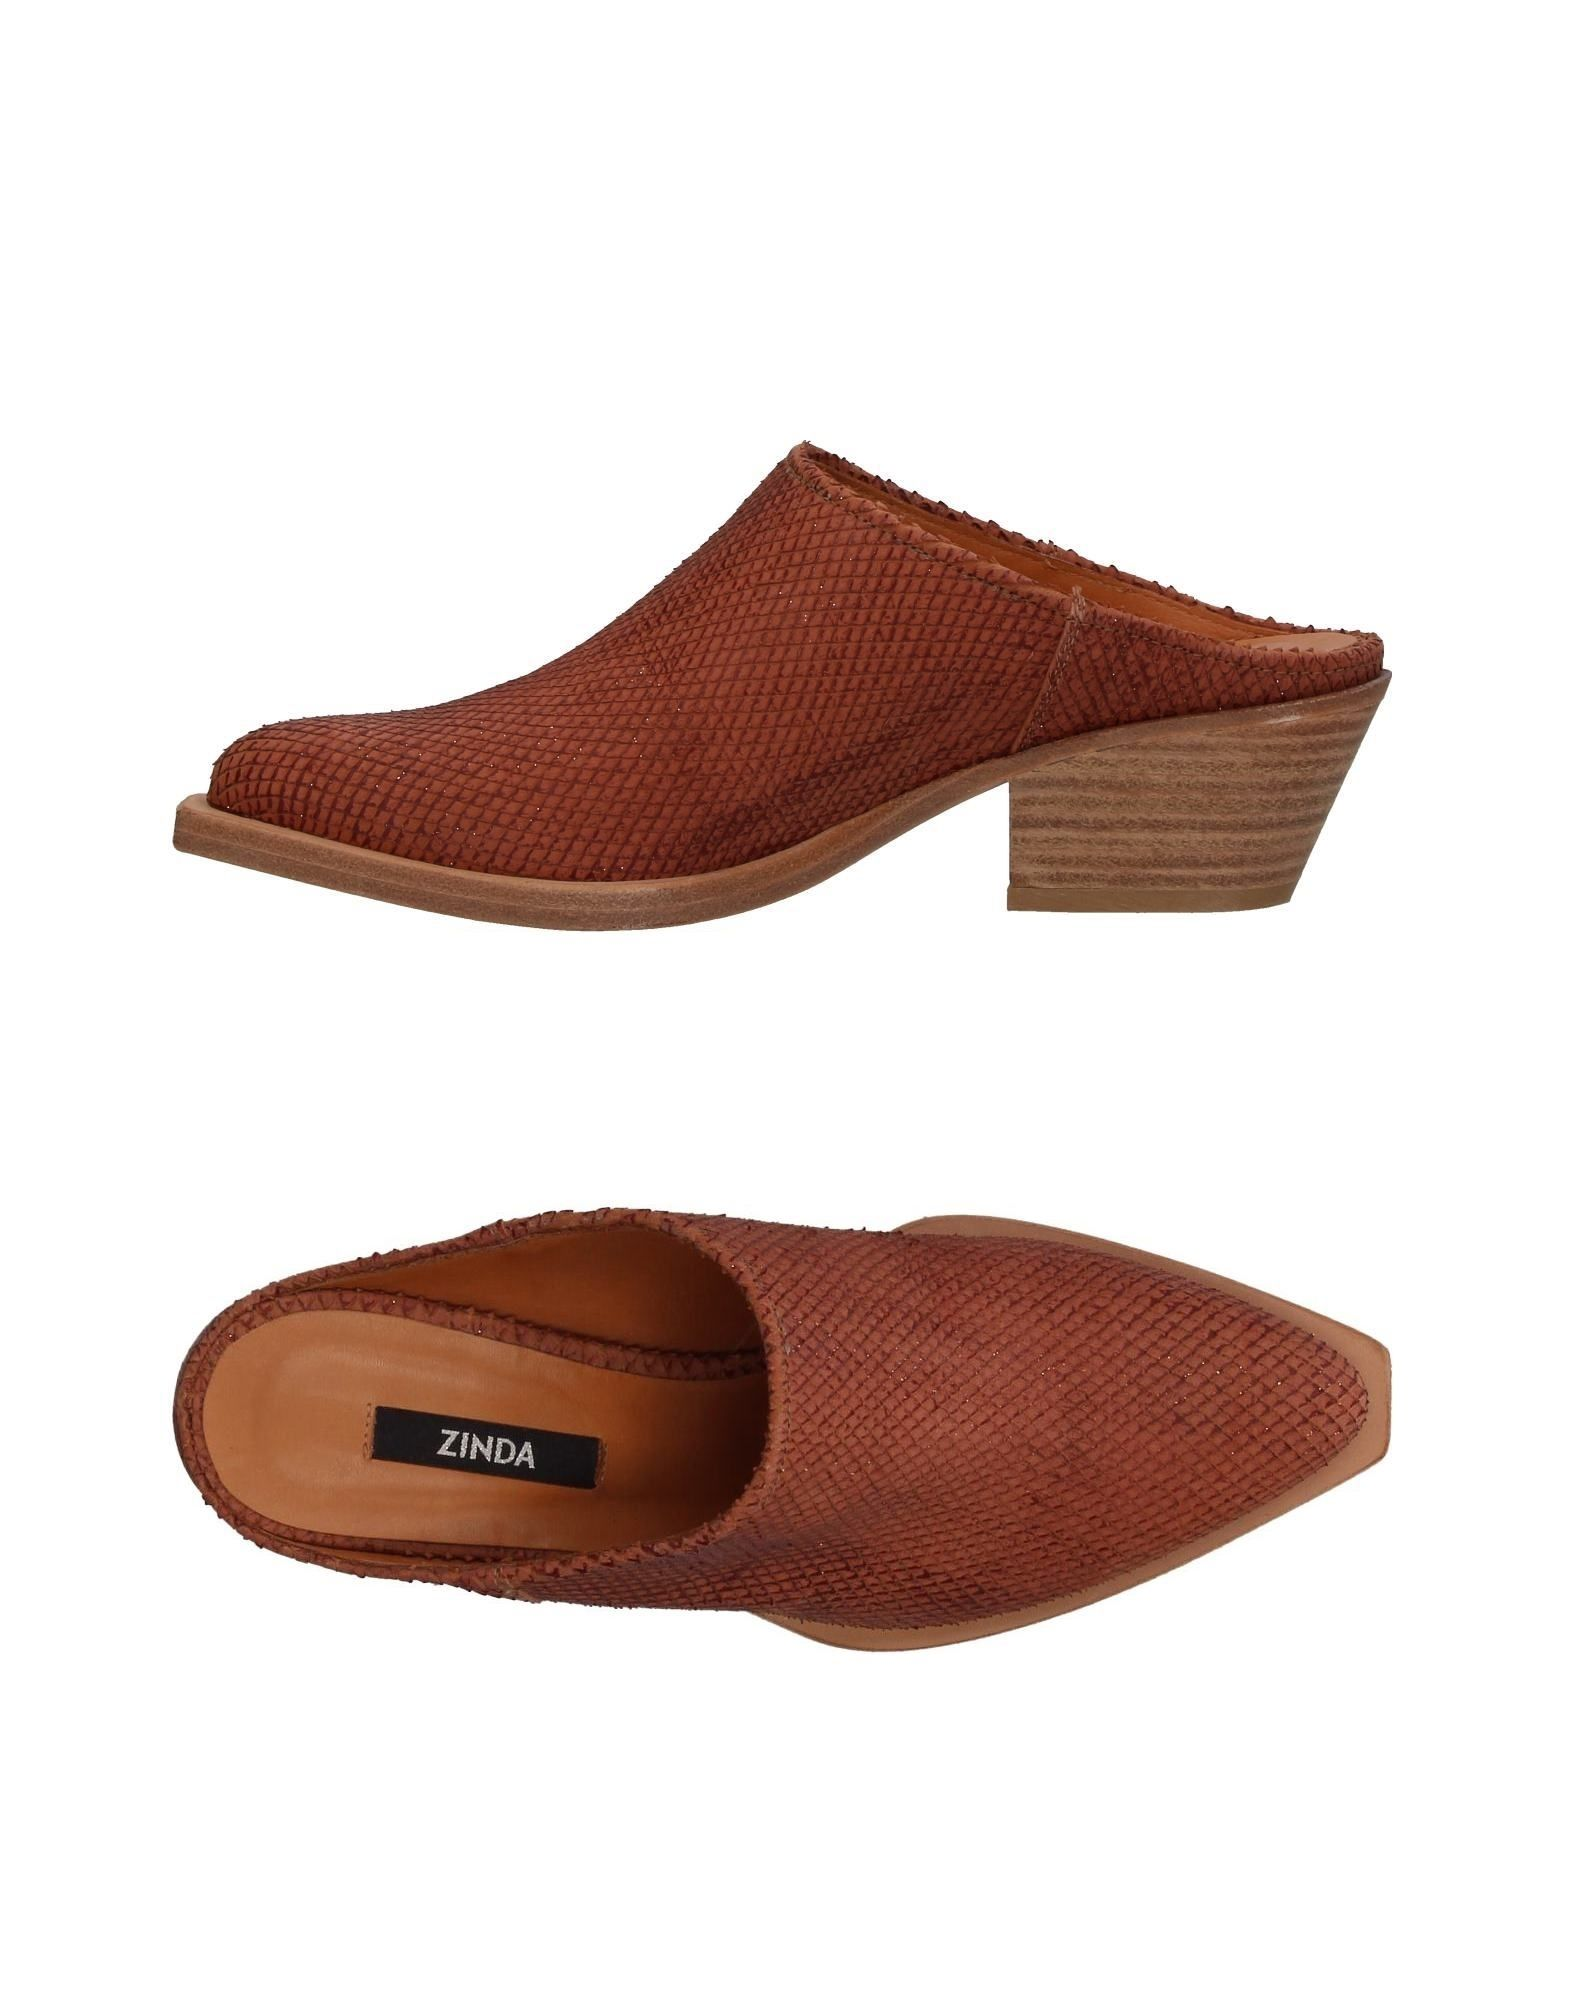 Zinda Pantoletten Damen  11407456MP Gute Qualität beliebte Schuhe